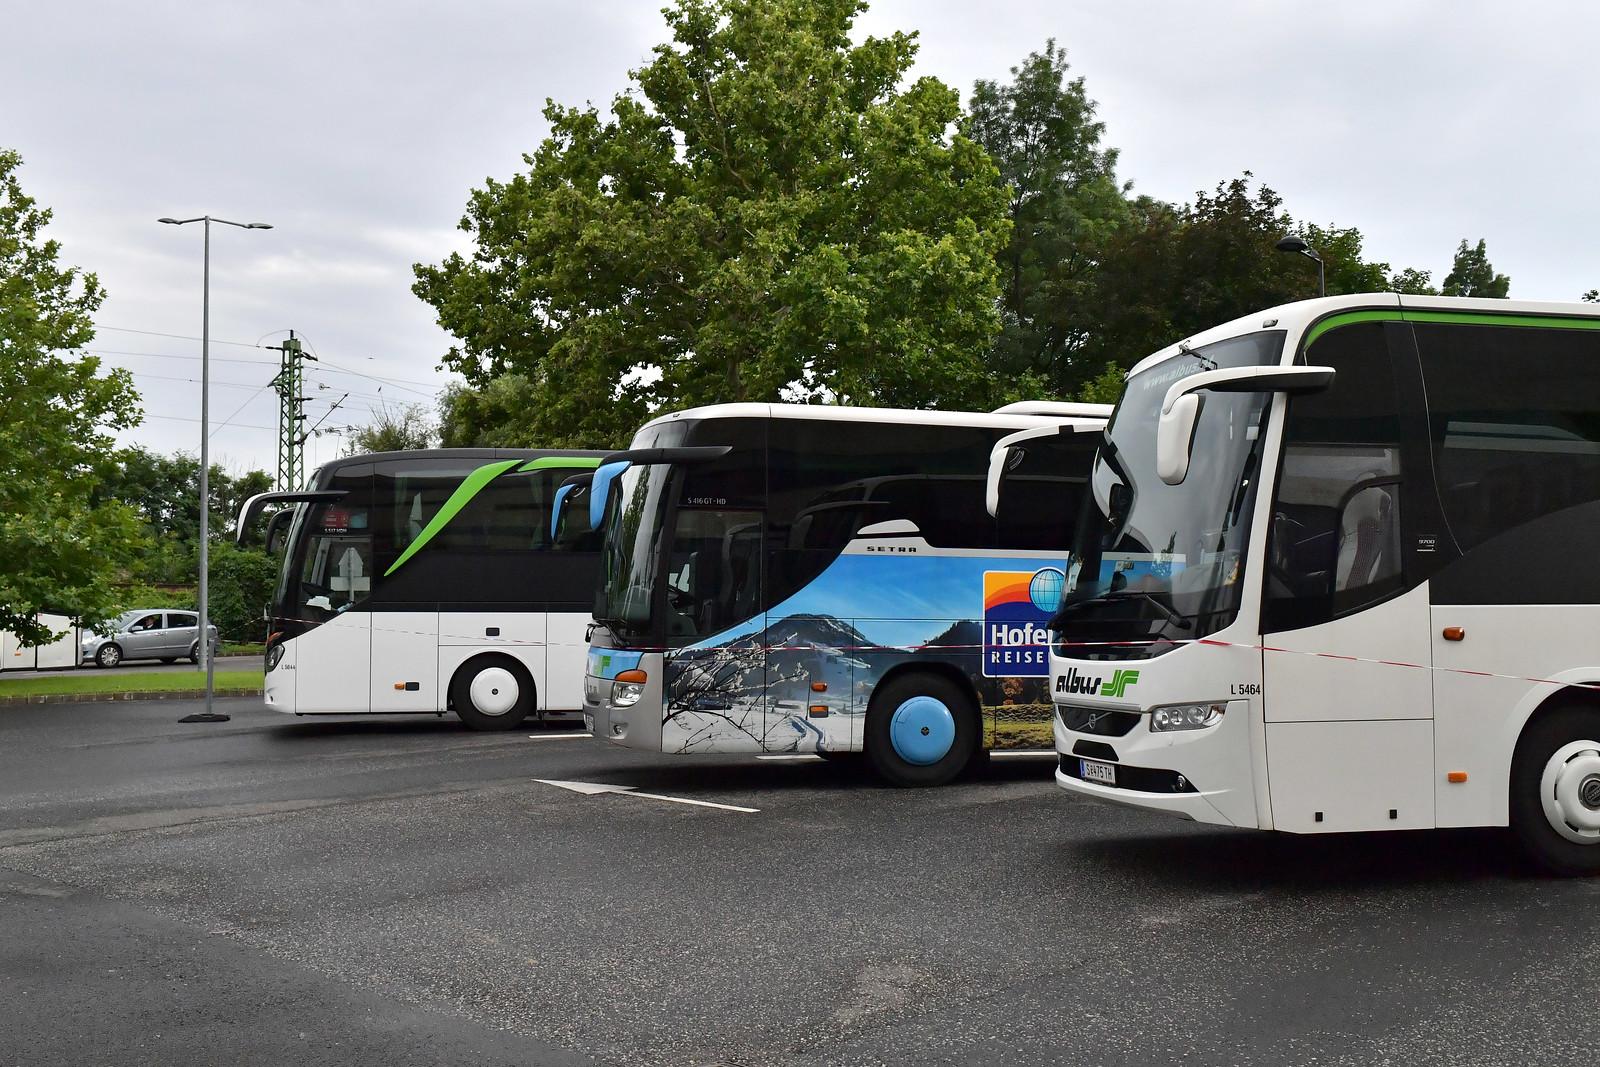 FY18 BPYO Tour - Bus Ride to Pecs (credit - Paul Marotta)